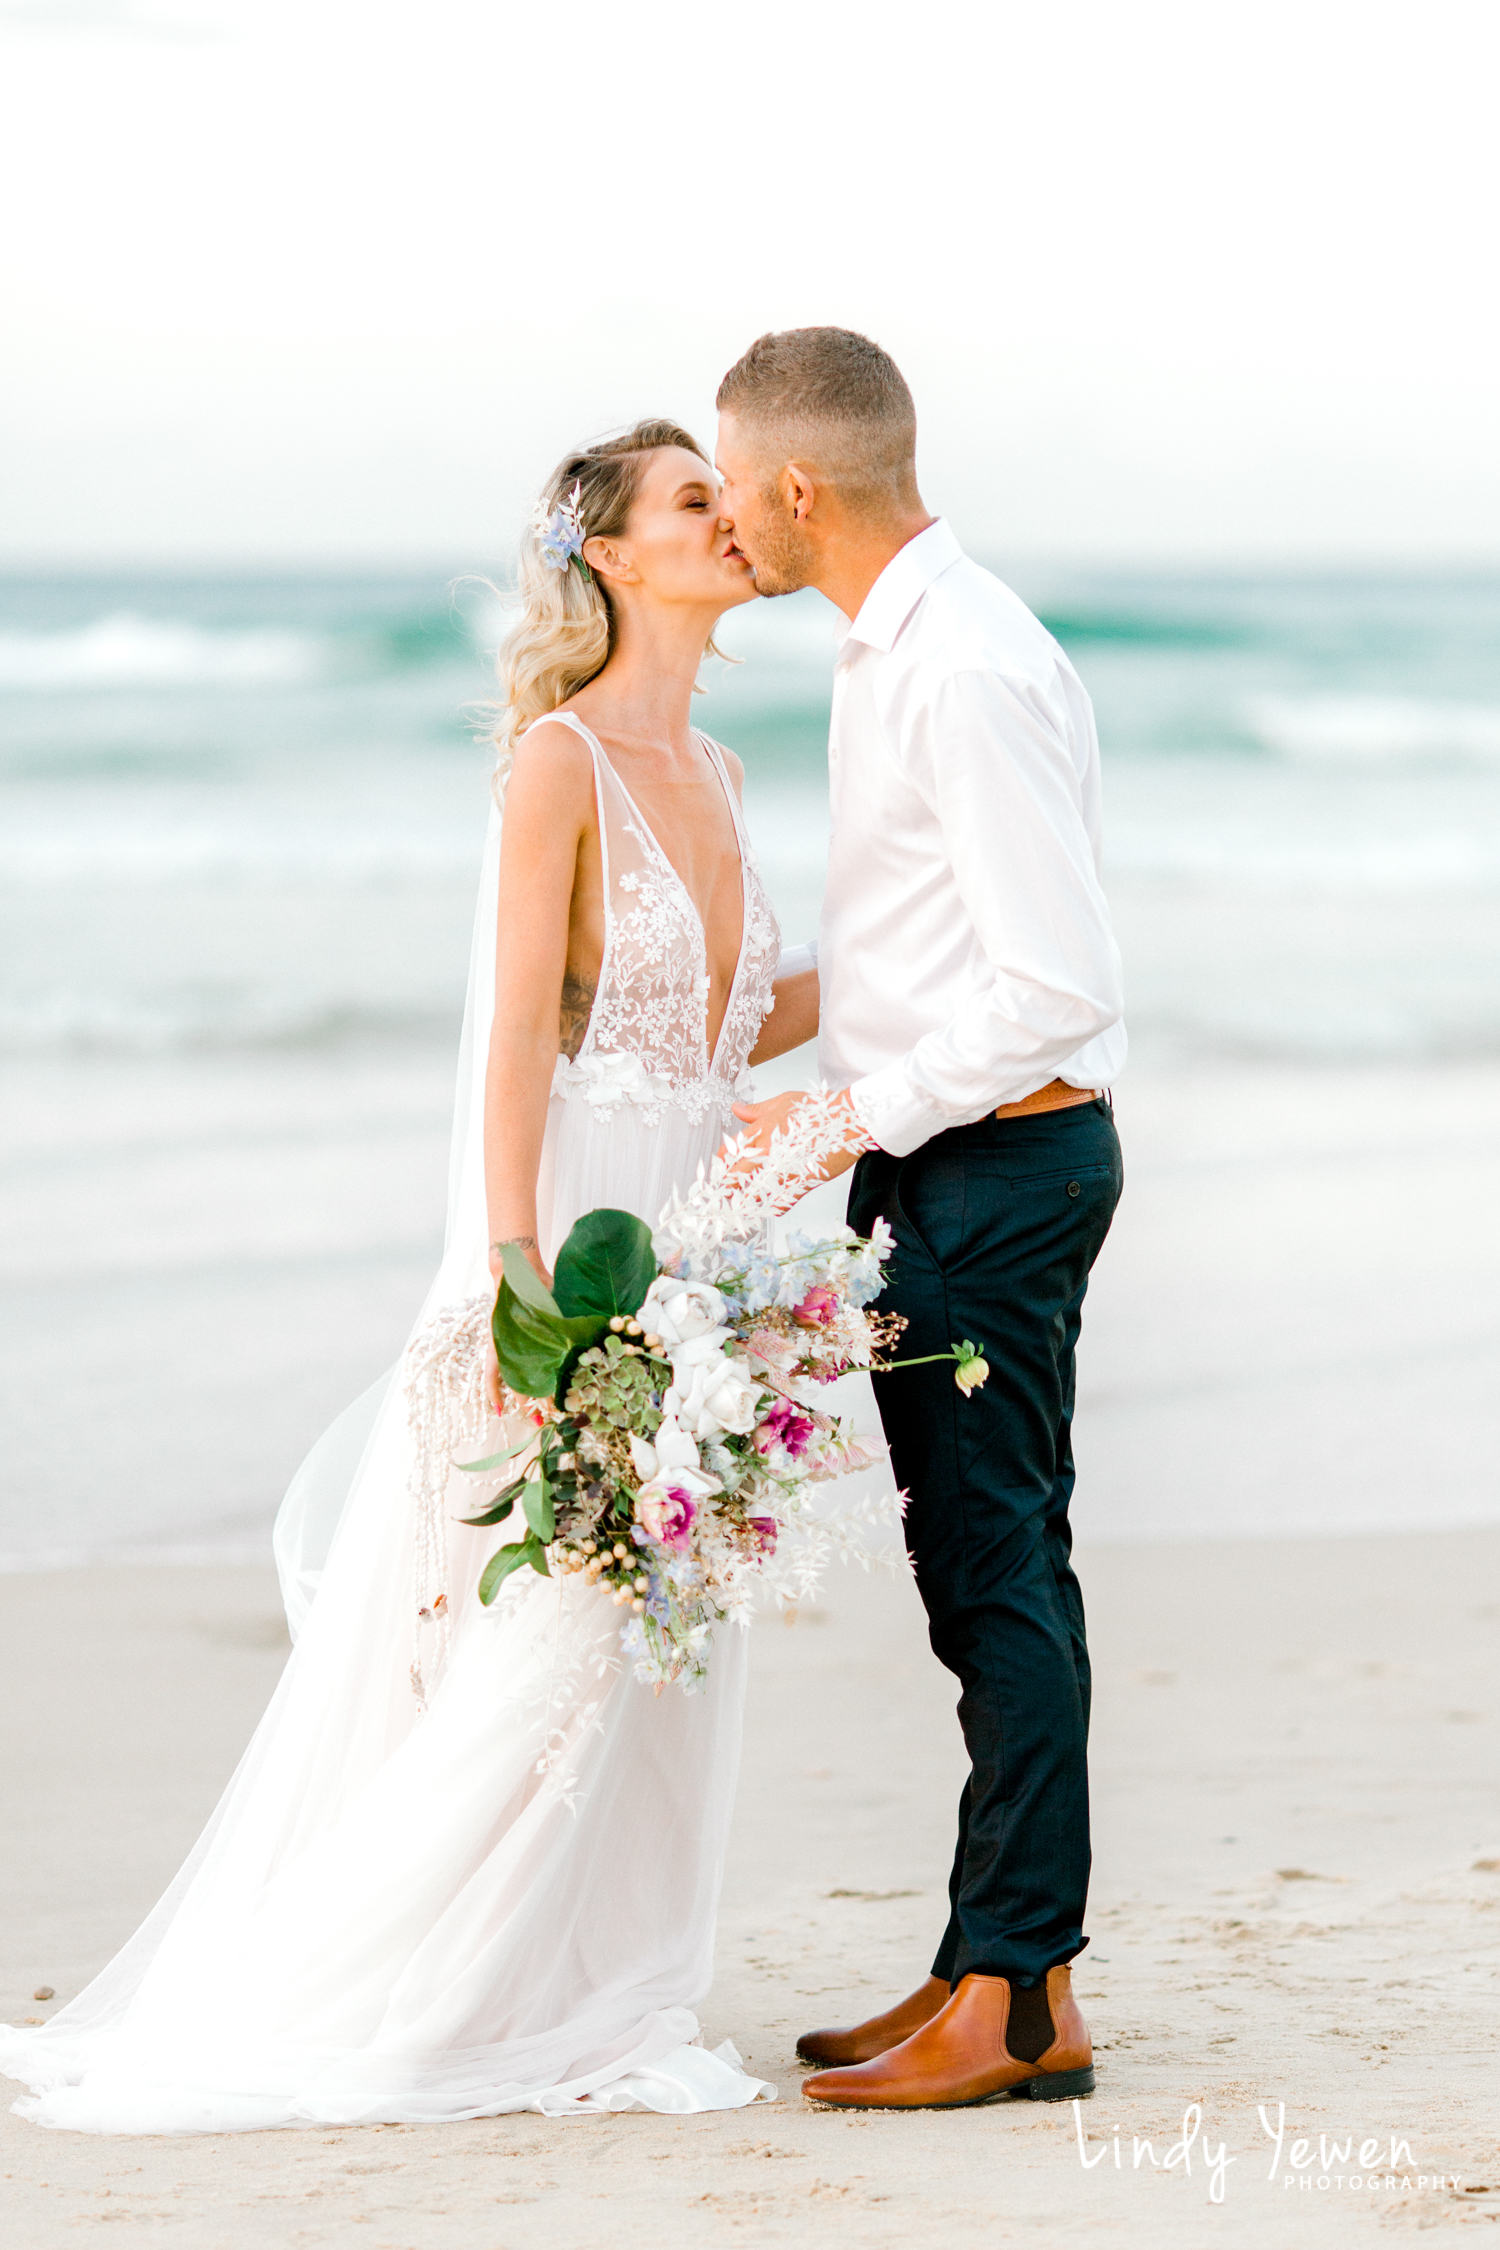 Lindy-Photography-Noosa-Weddings-Grace-Chris 262.jpg